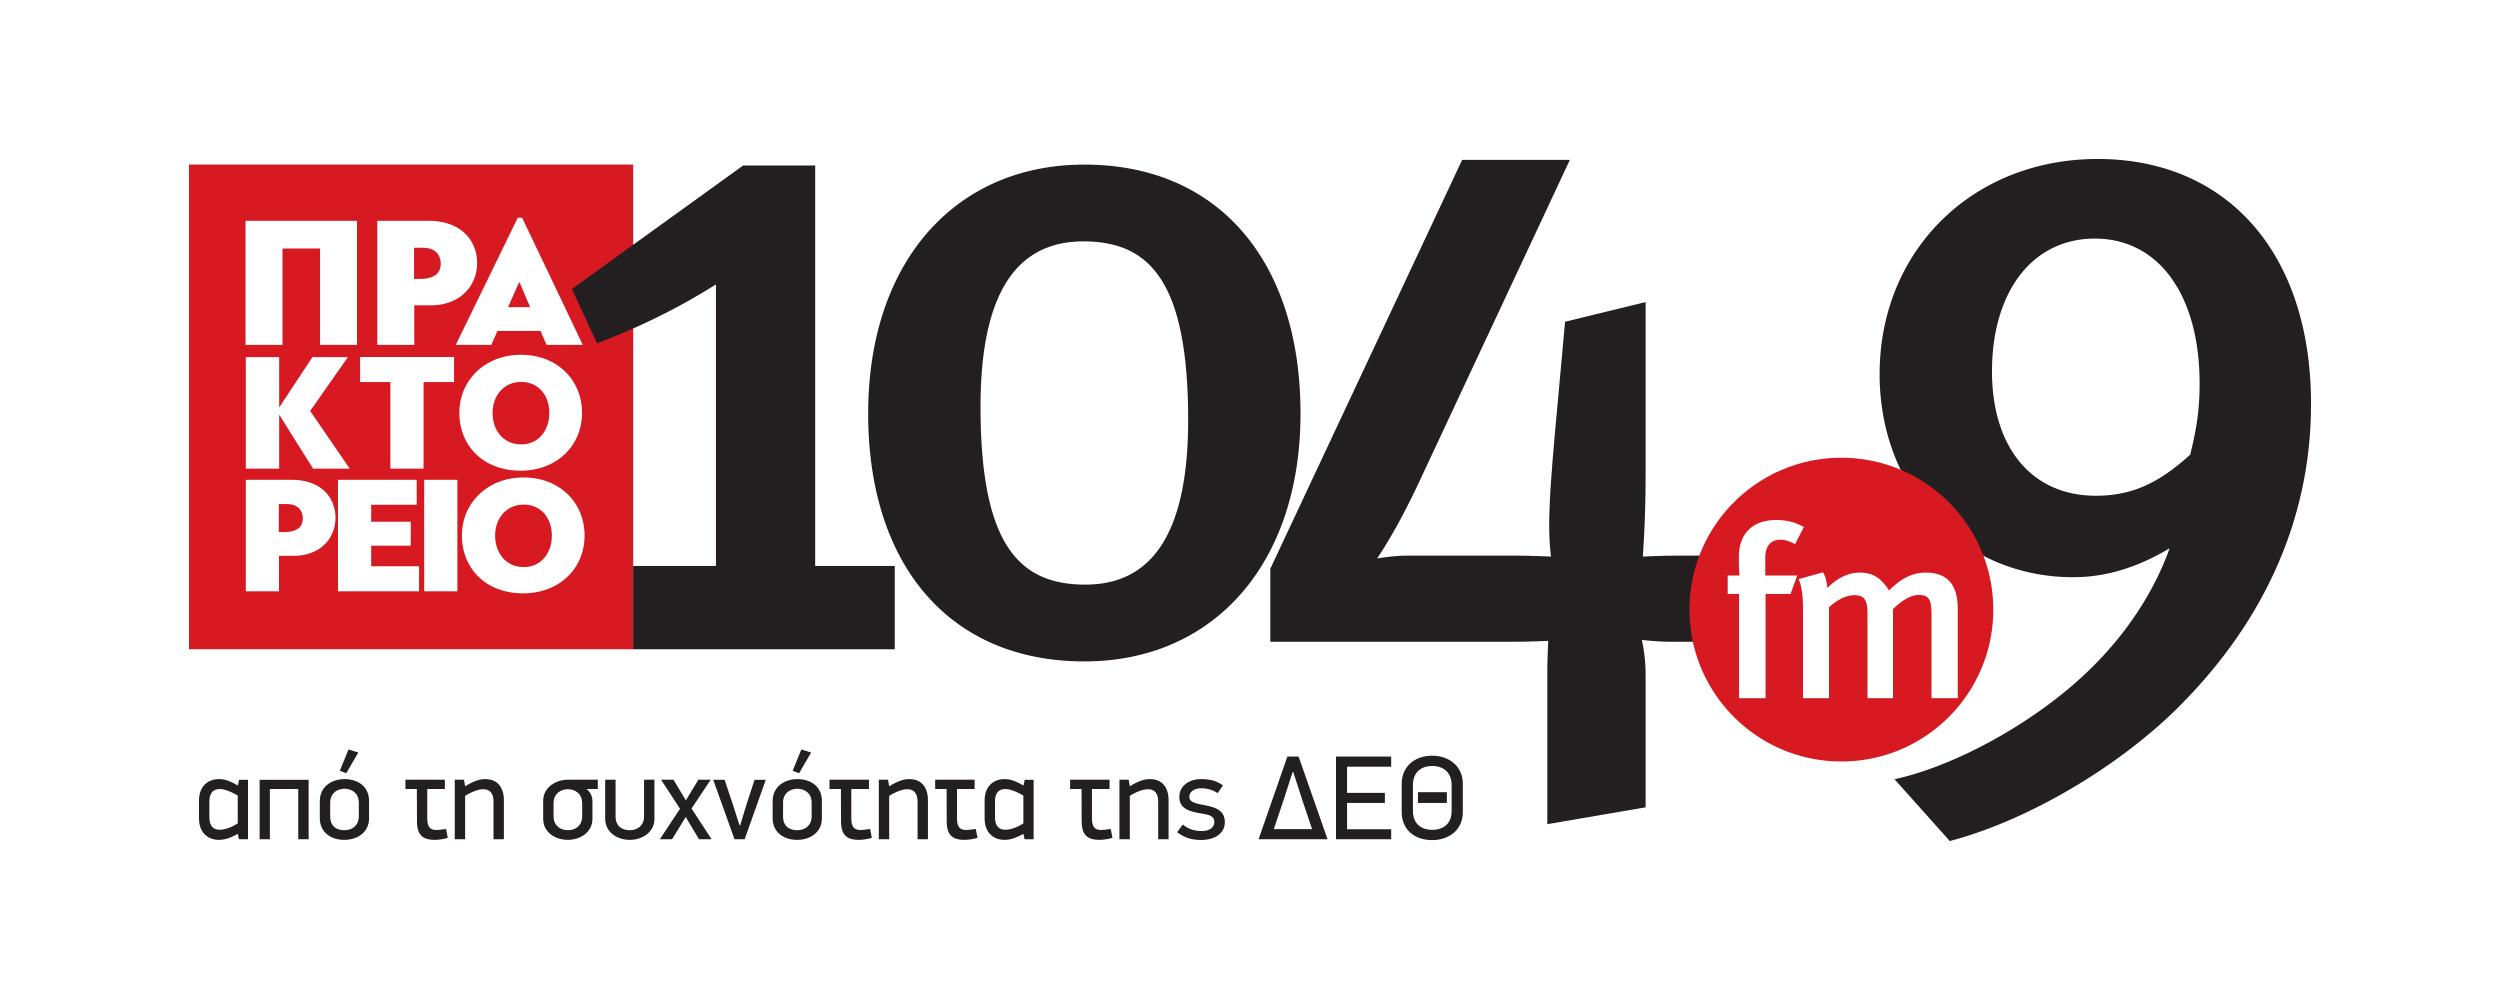 LOGO_PRAKTOREIO_FM_104.9_new_C.jpg